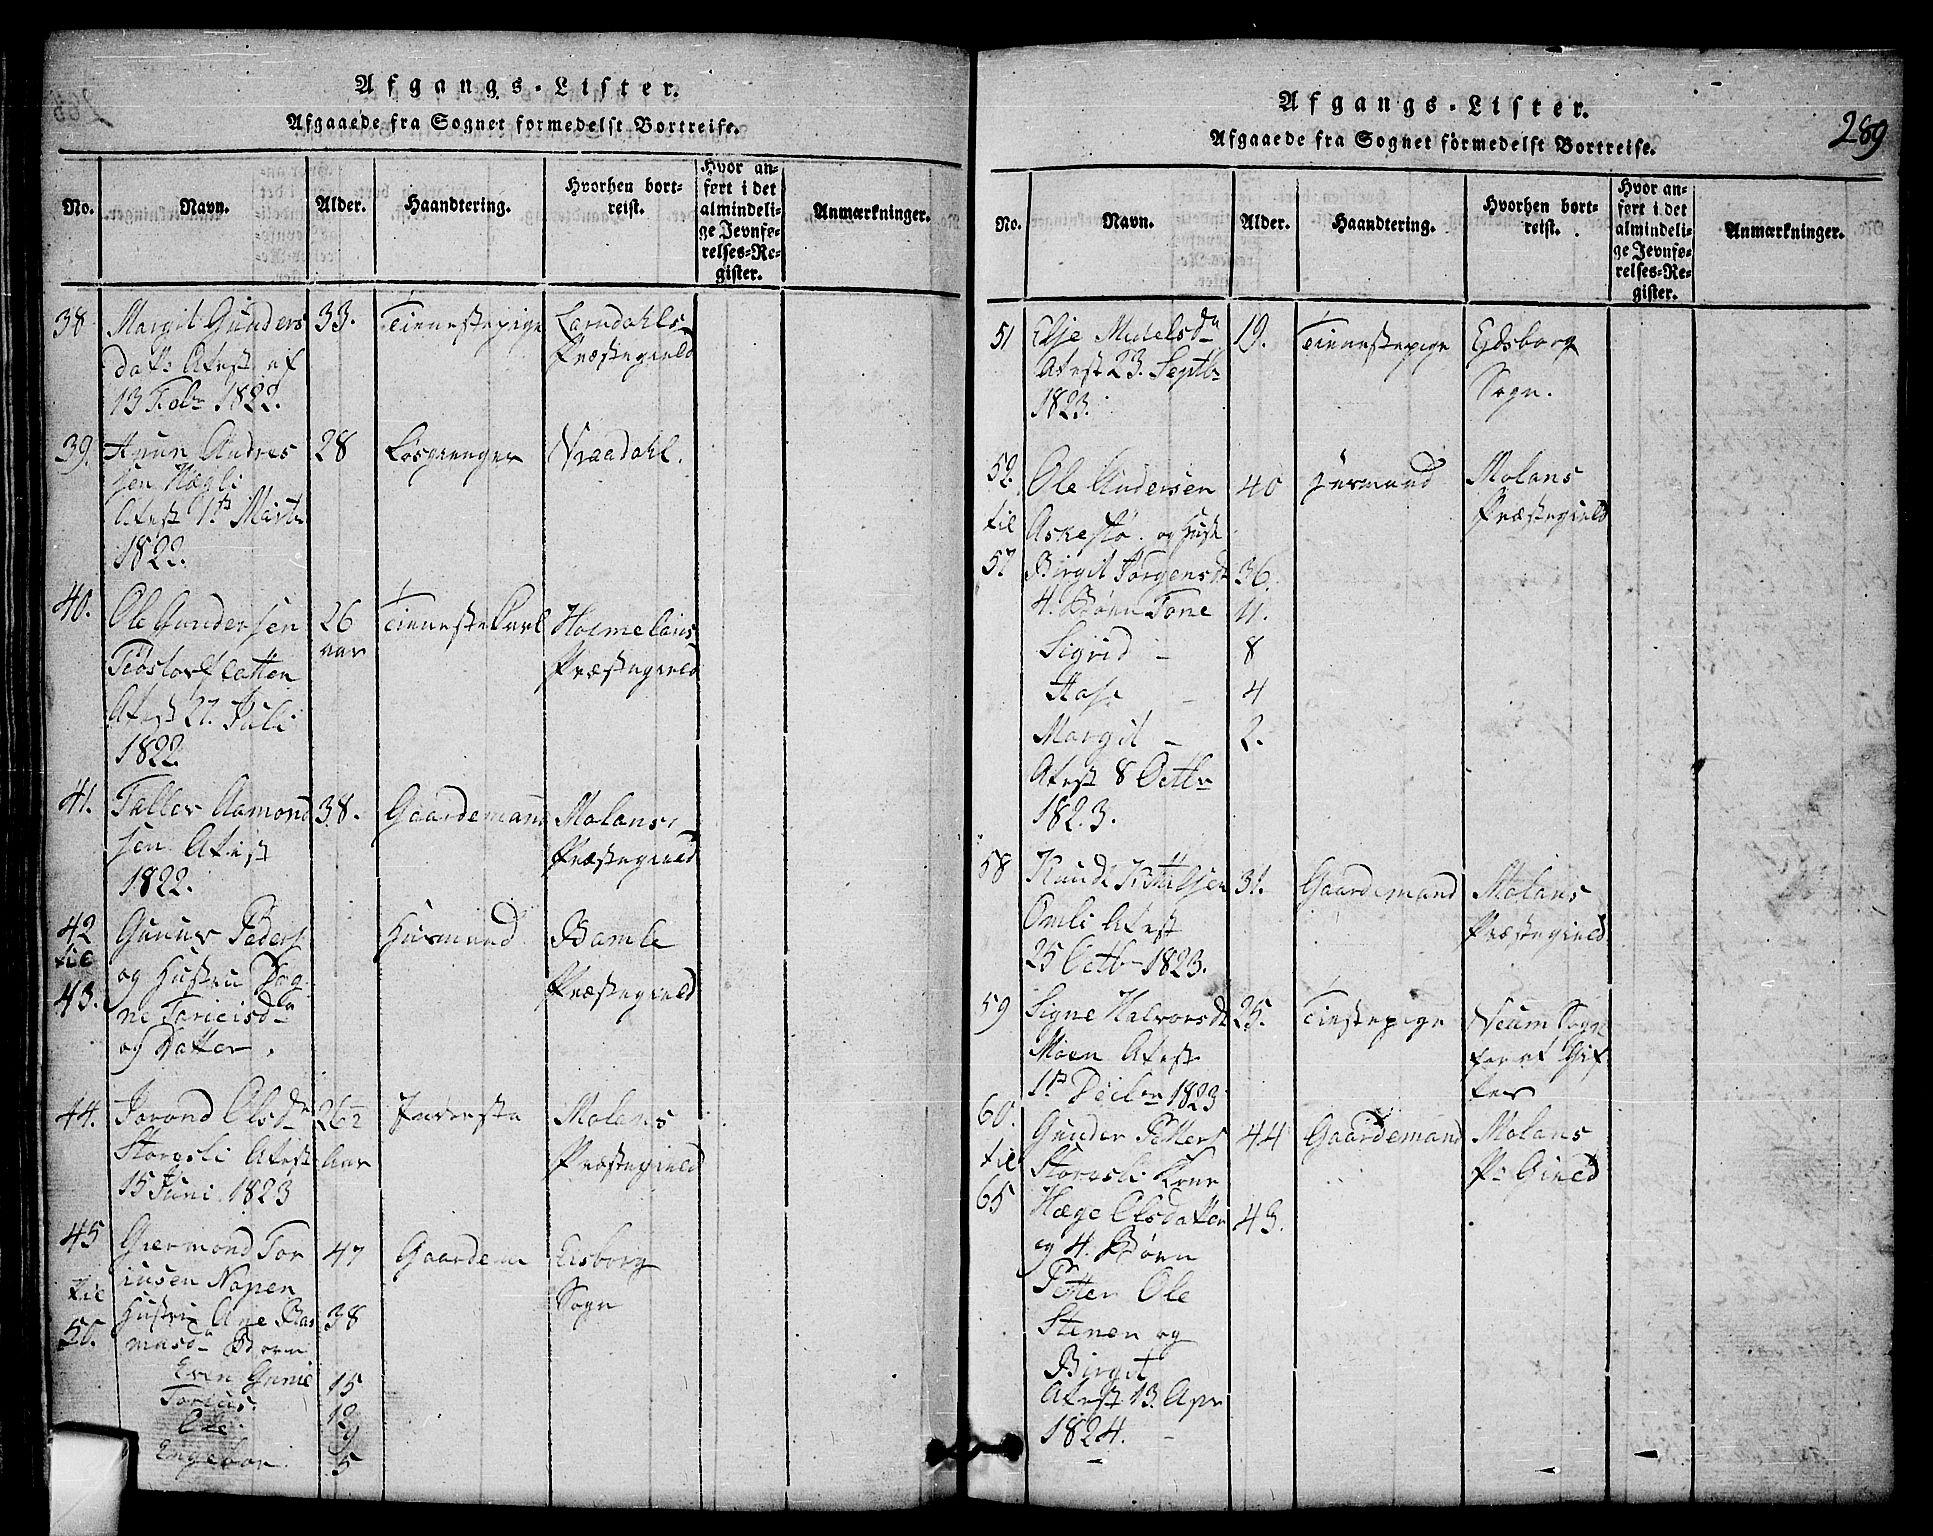 SAKO, Mo kirkebøker, G/Gb/L0001: Klokkerbok nr. II 1, 1814-1843, s. 289